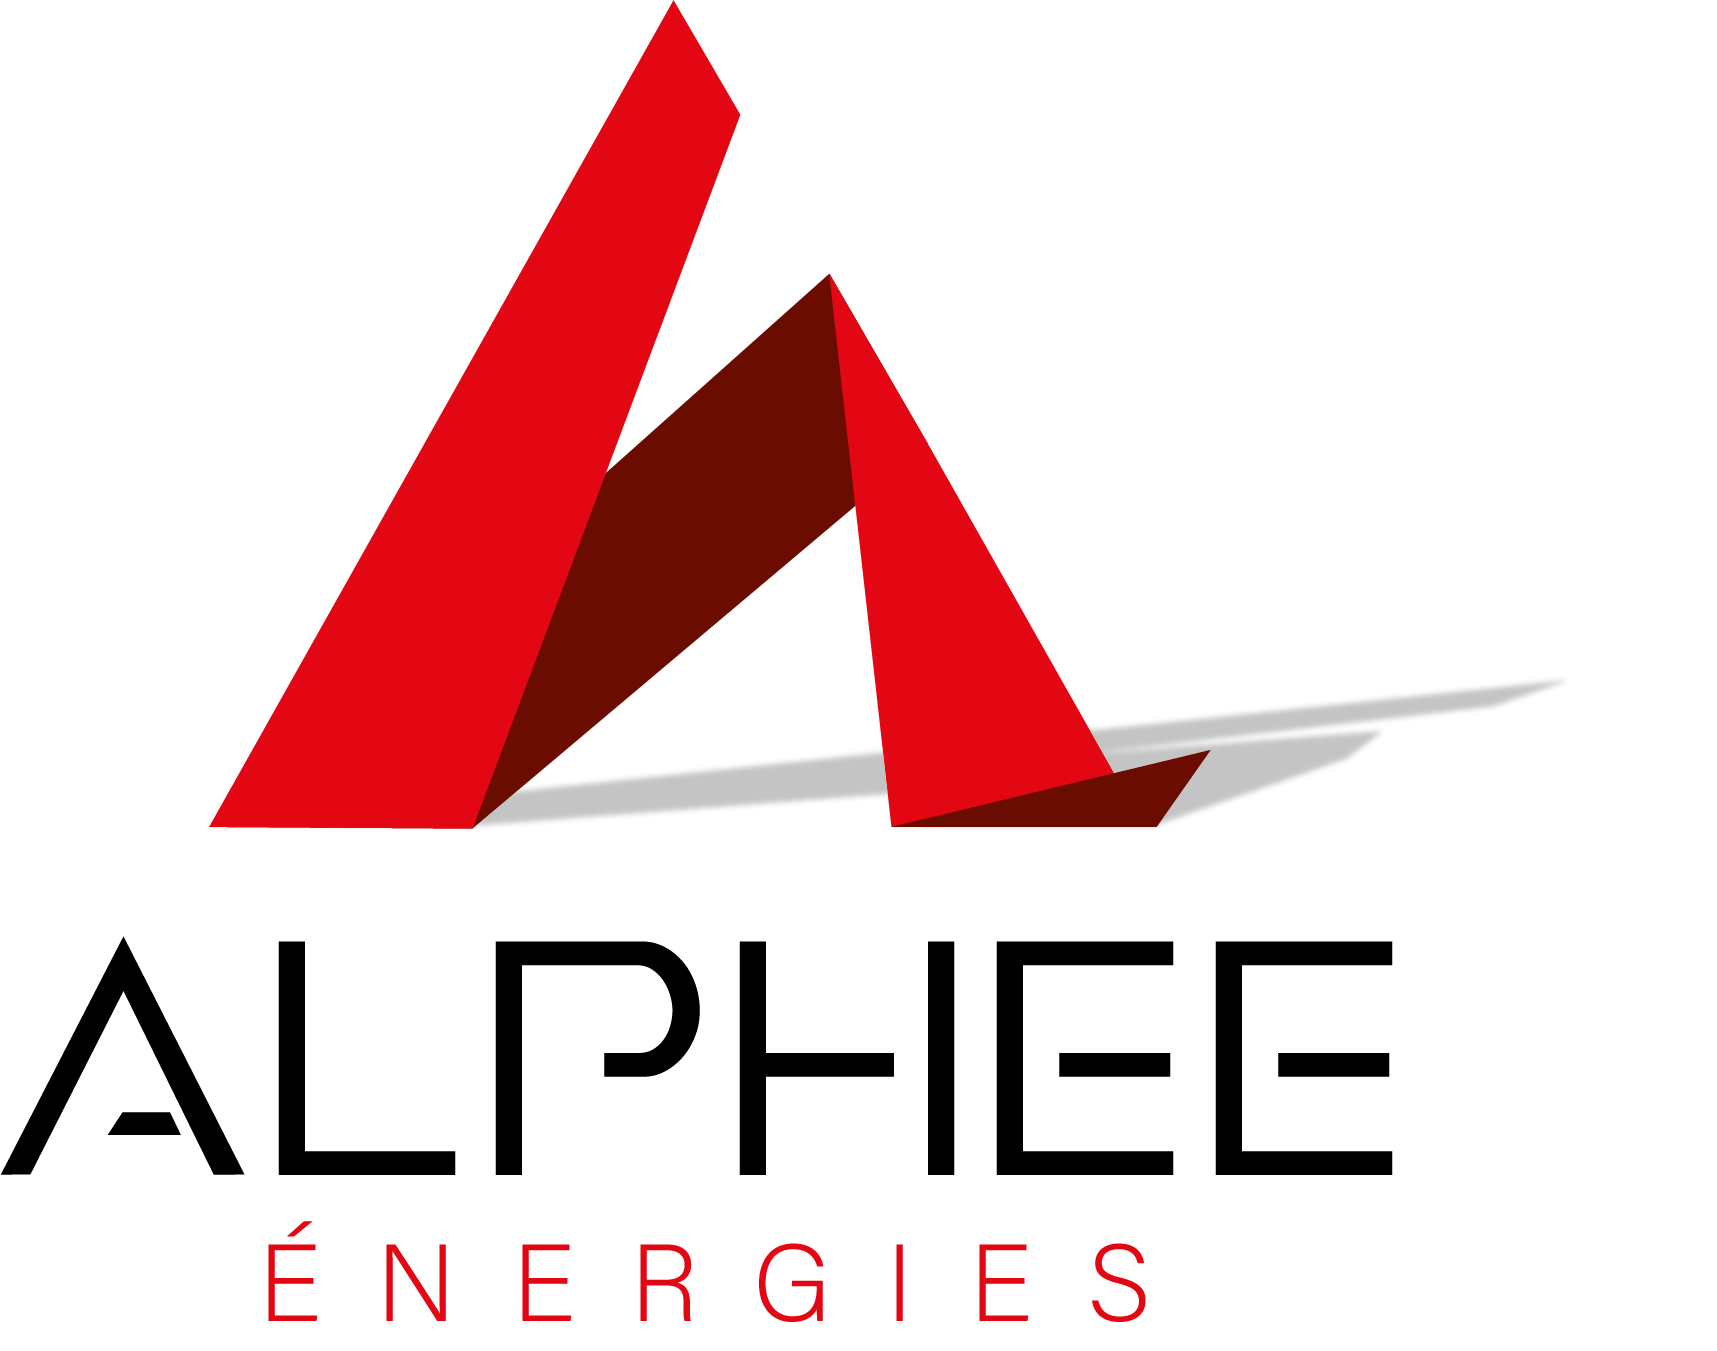 Alphee Energies